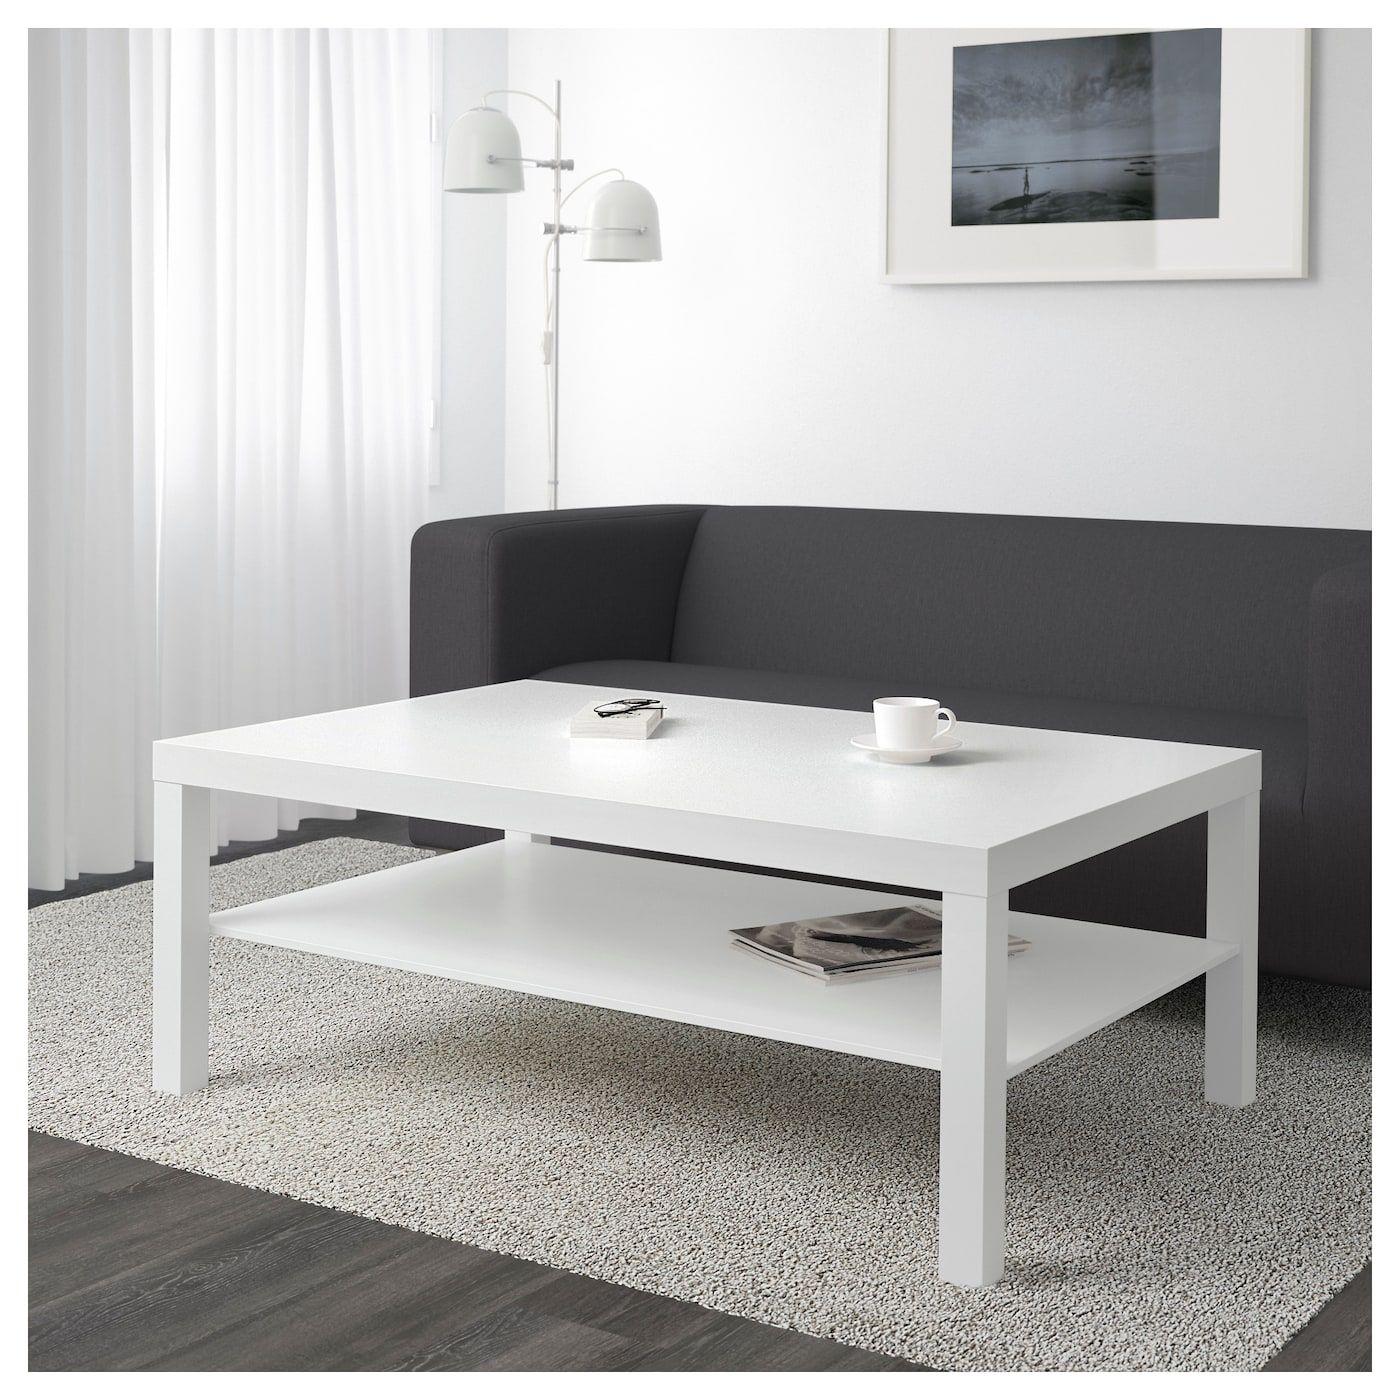 Furniture and Home Furnishings Ikea lack coffee table